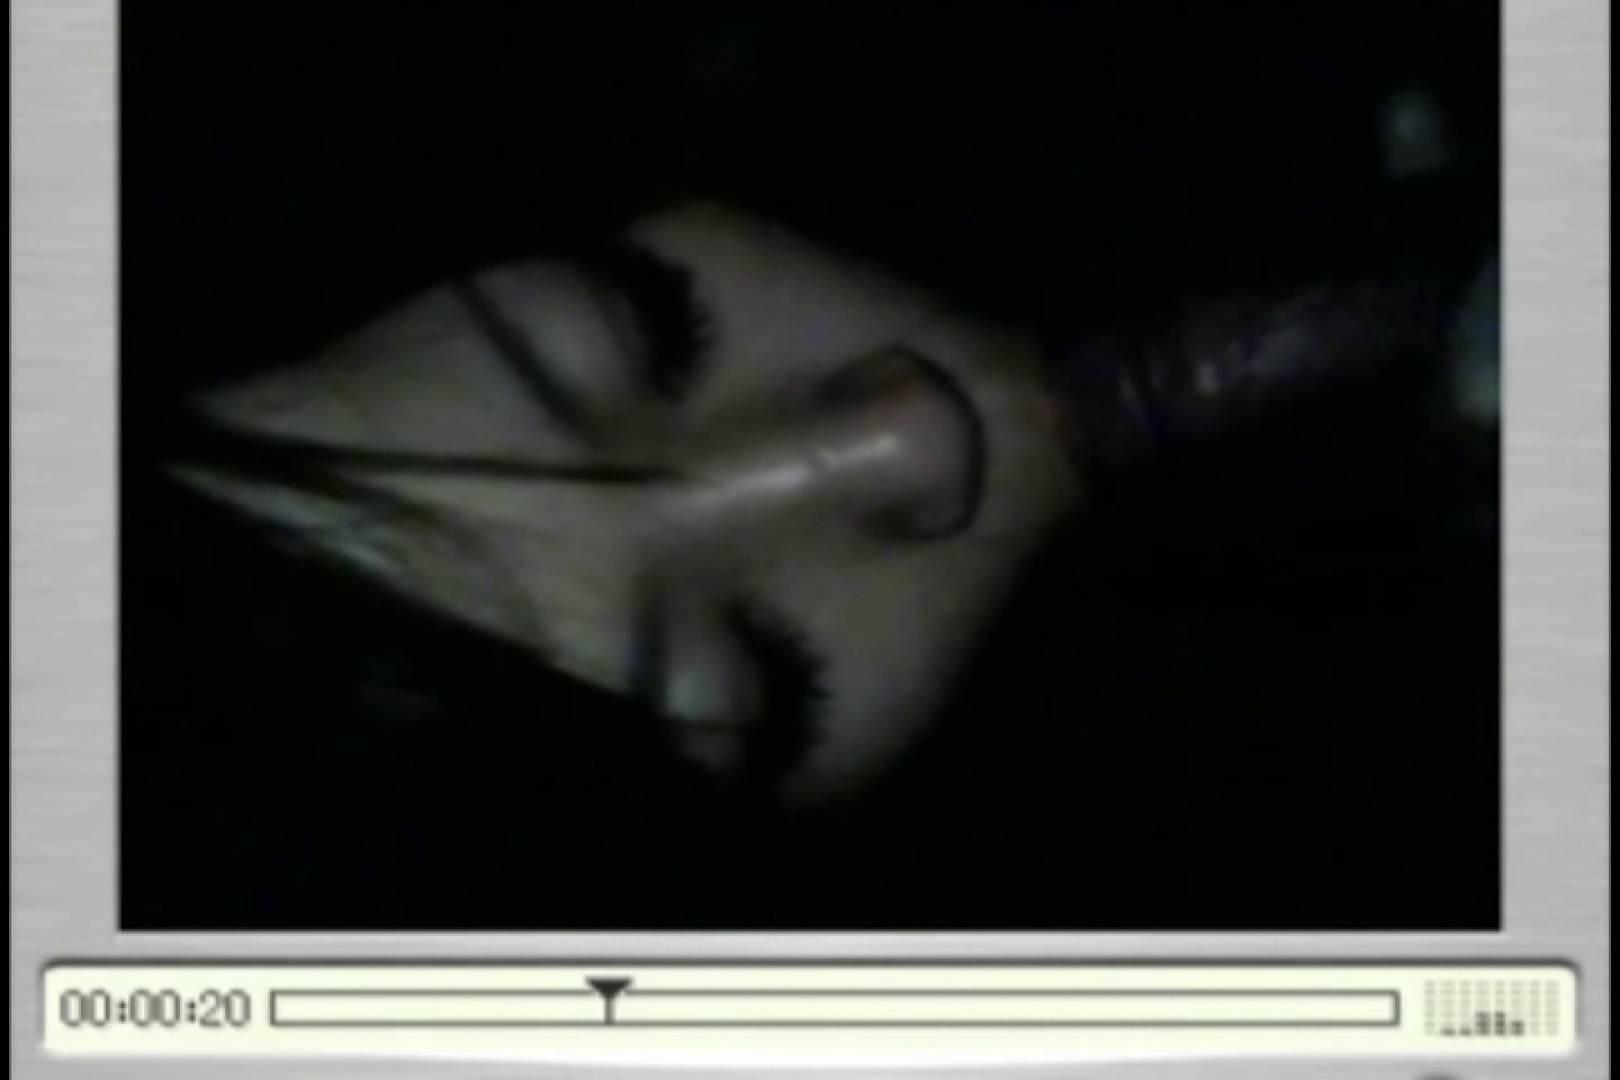 Shigeruのアルバム 流出作品  98pic 2